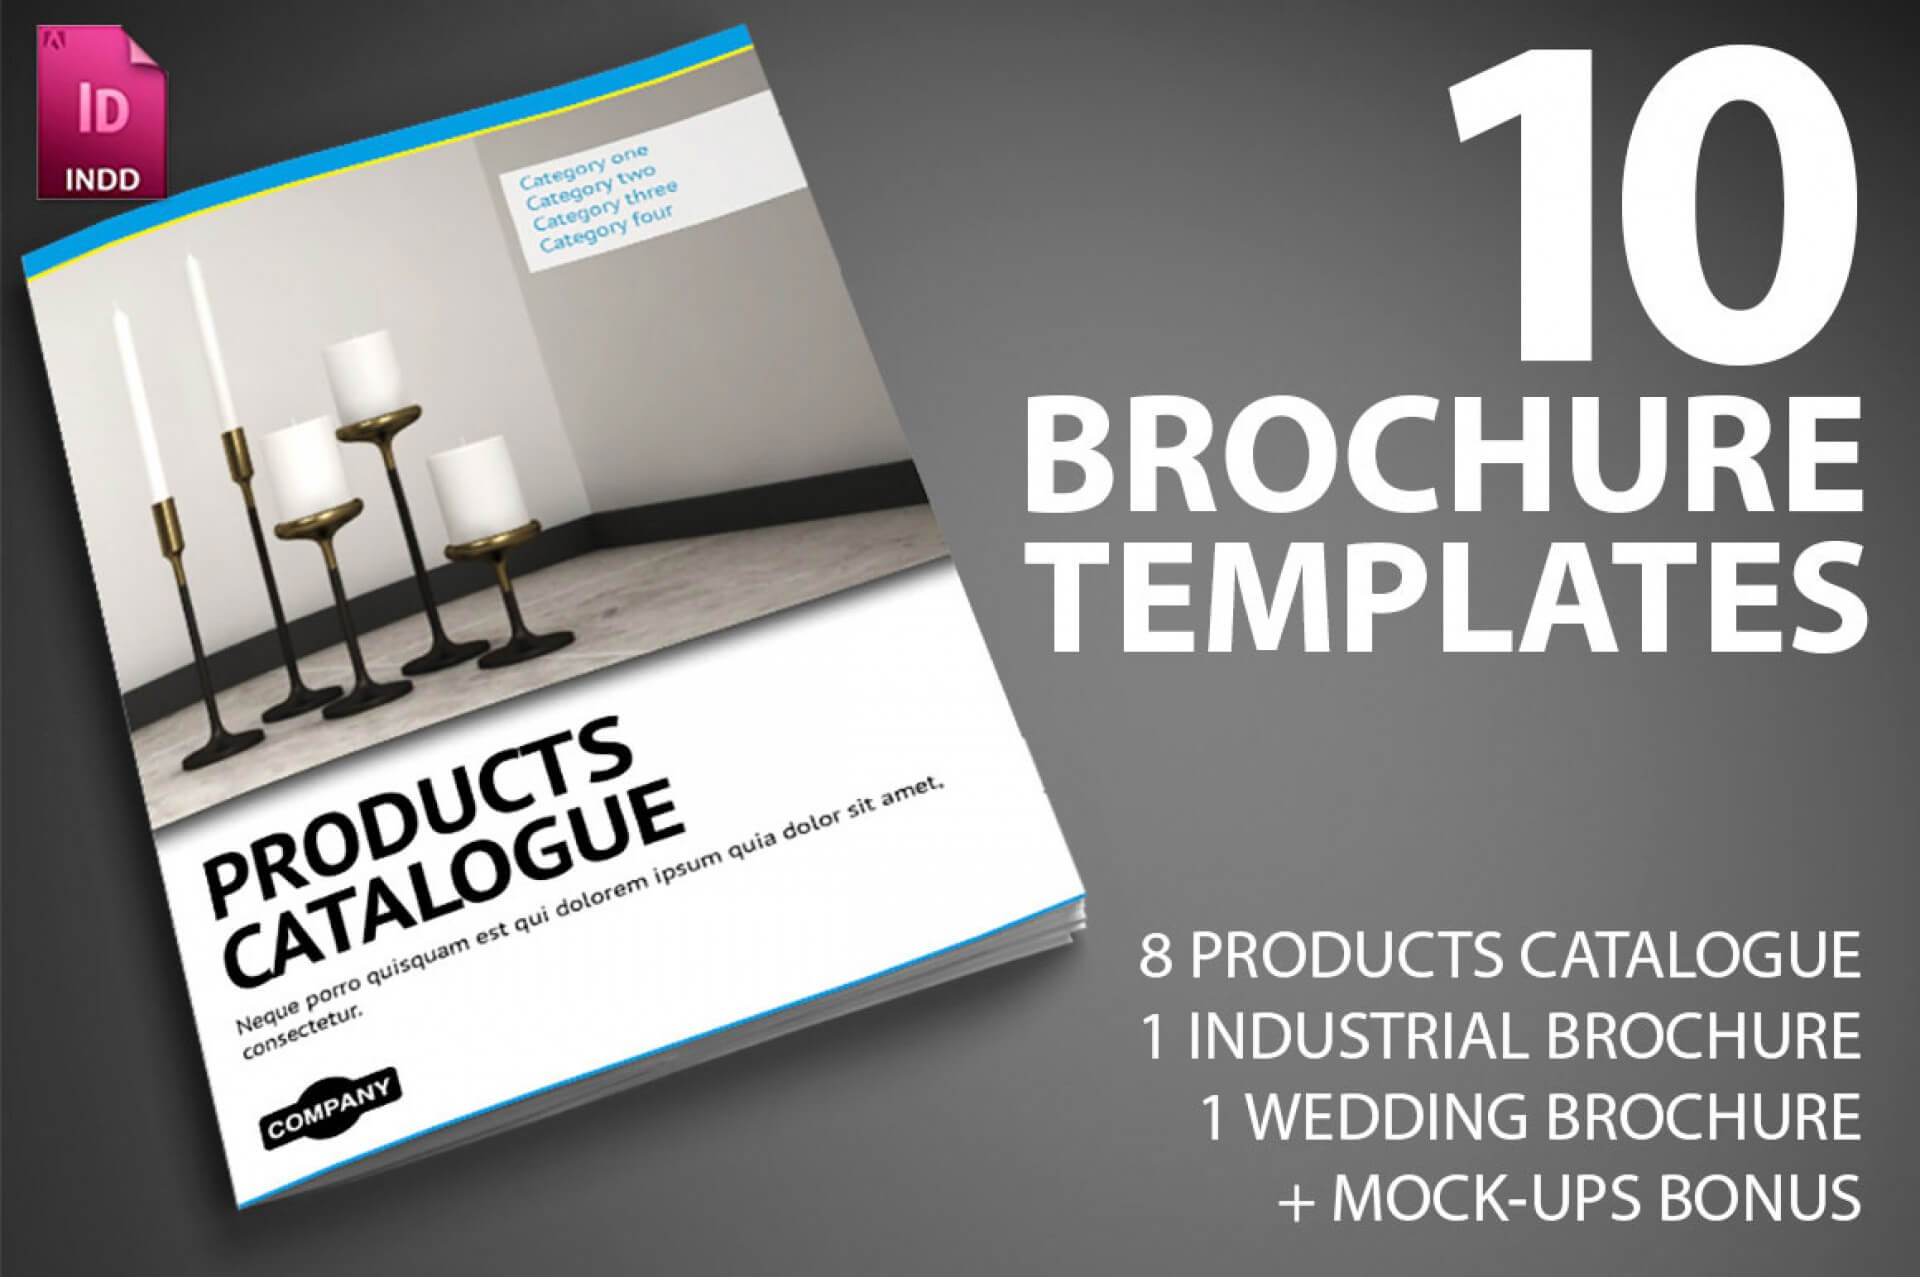 002 Indesign Brochure Template Free Stirring Ideas A4 pertaining to Brochure Templates Free Download Indesign